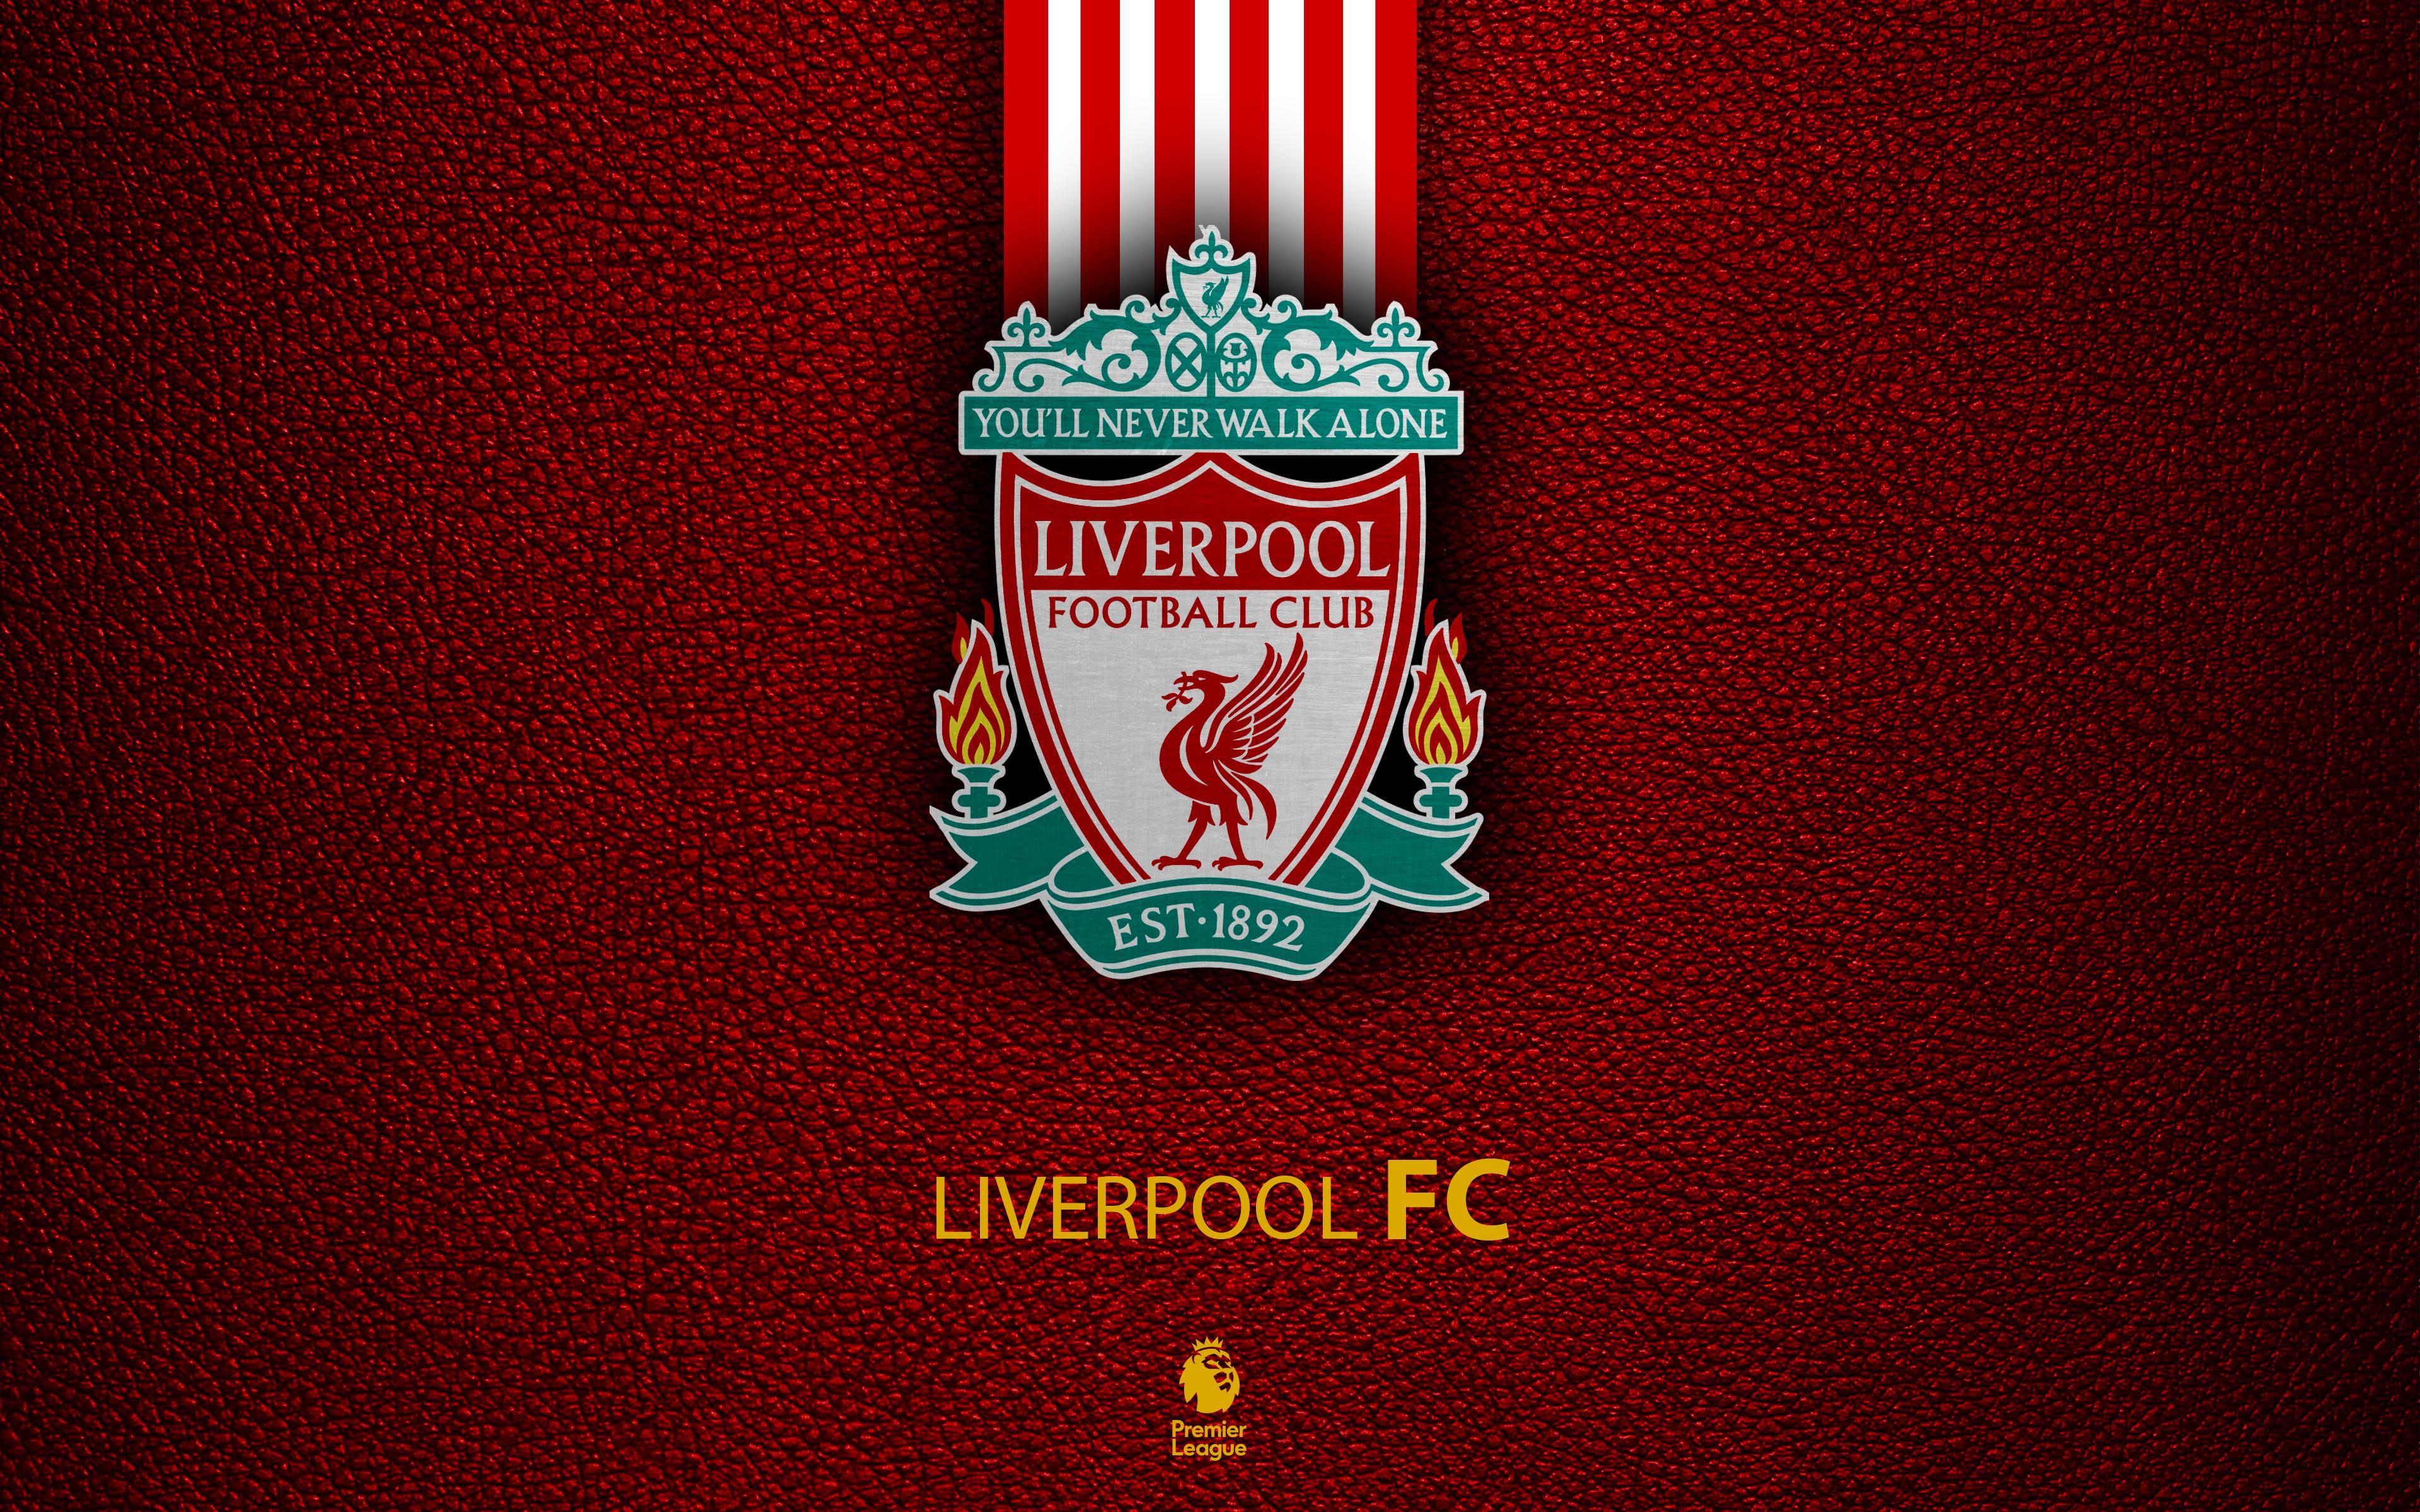 Liverpool Club Logo 2019 Wallpapers - Wallpaper Cave